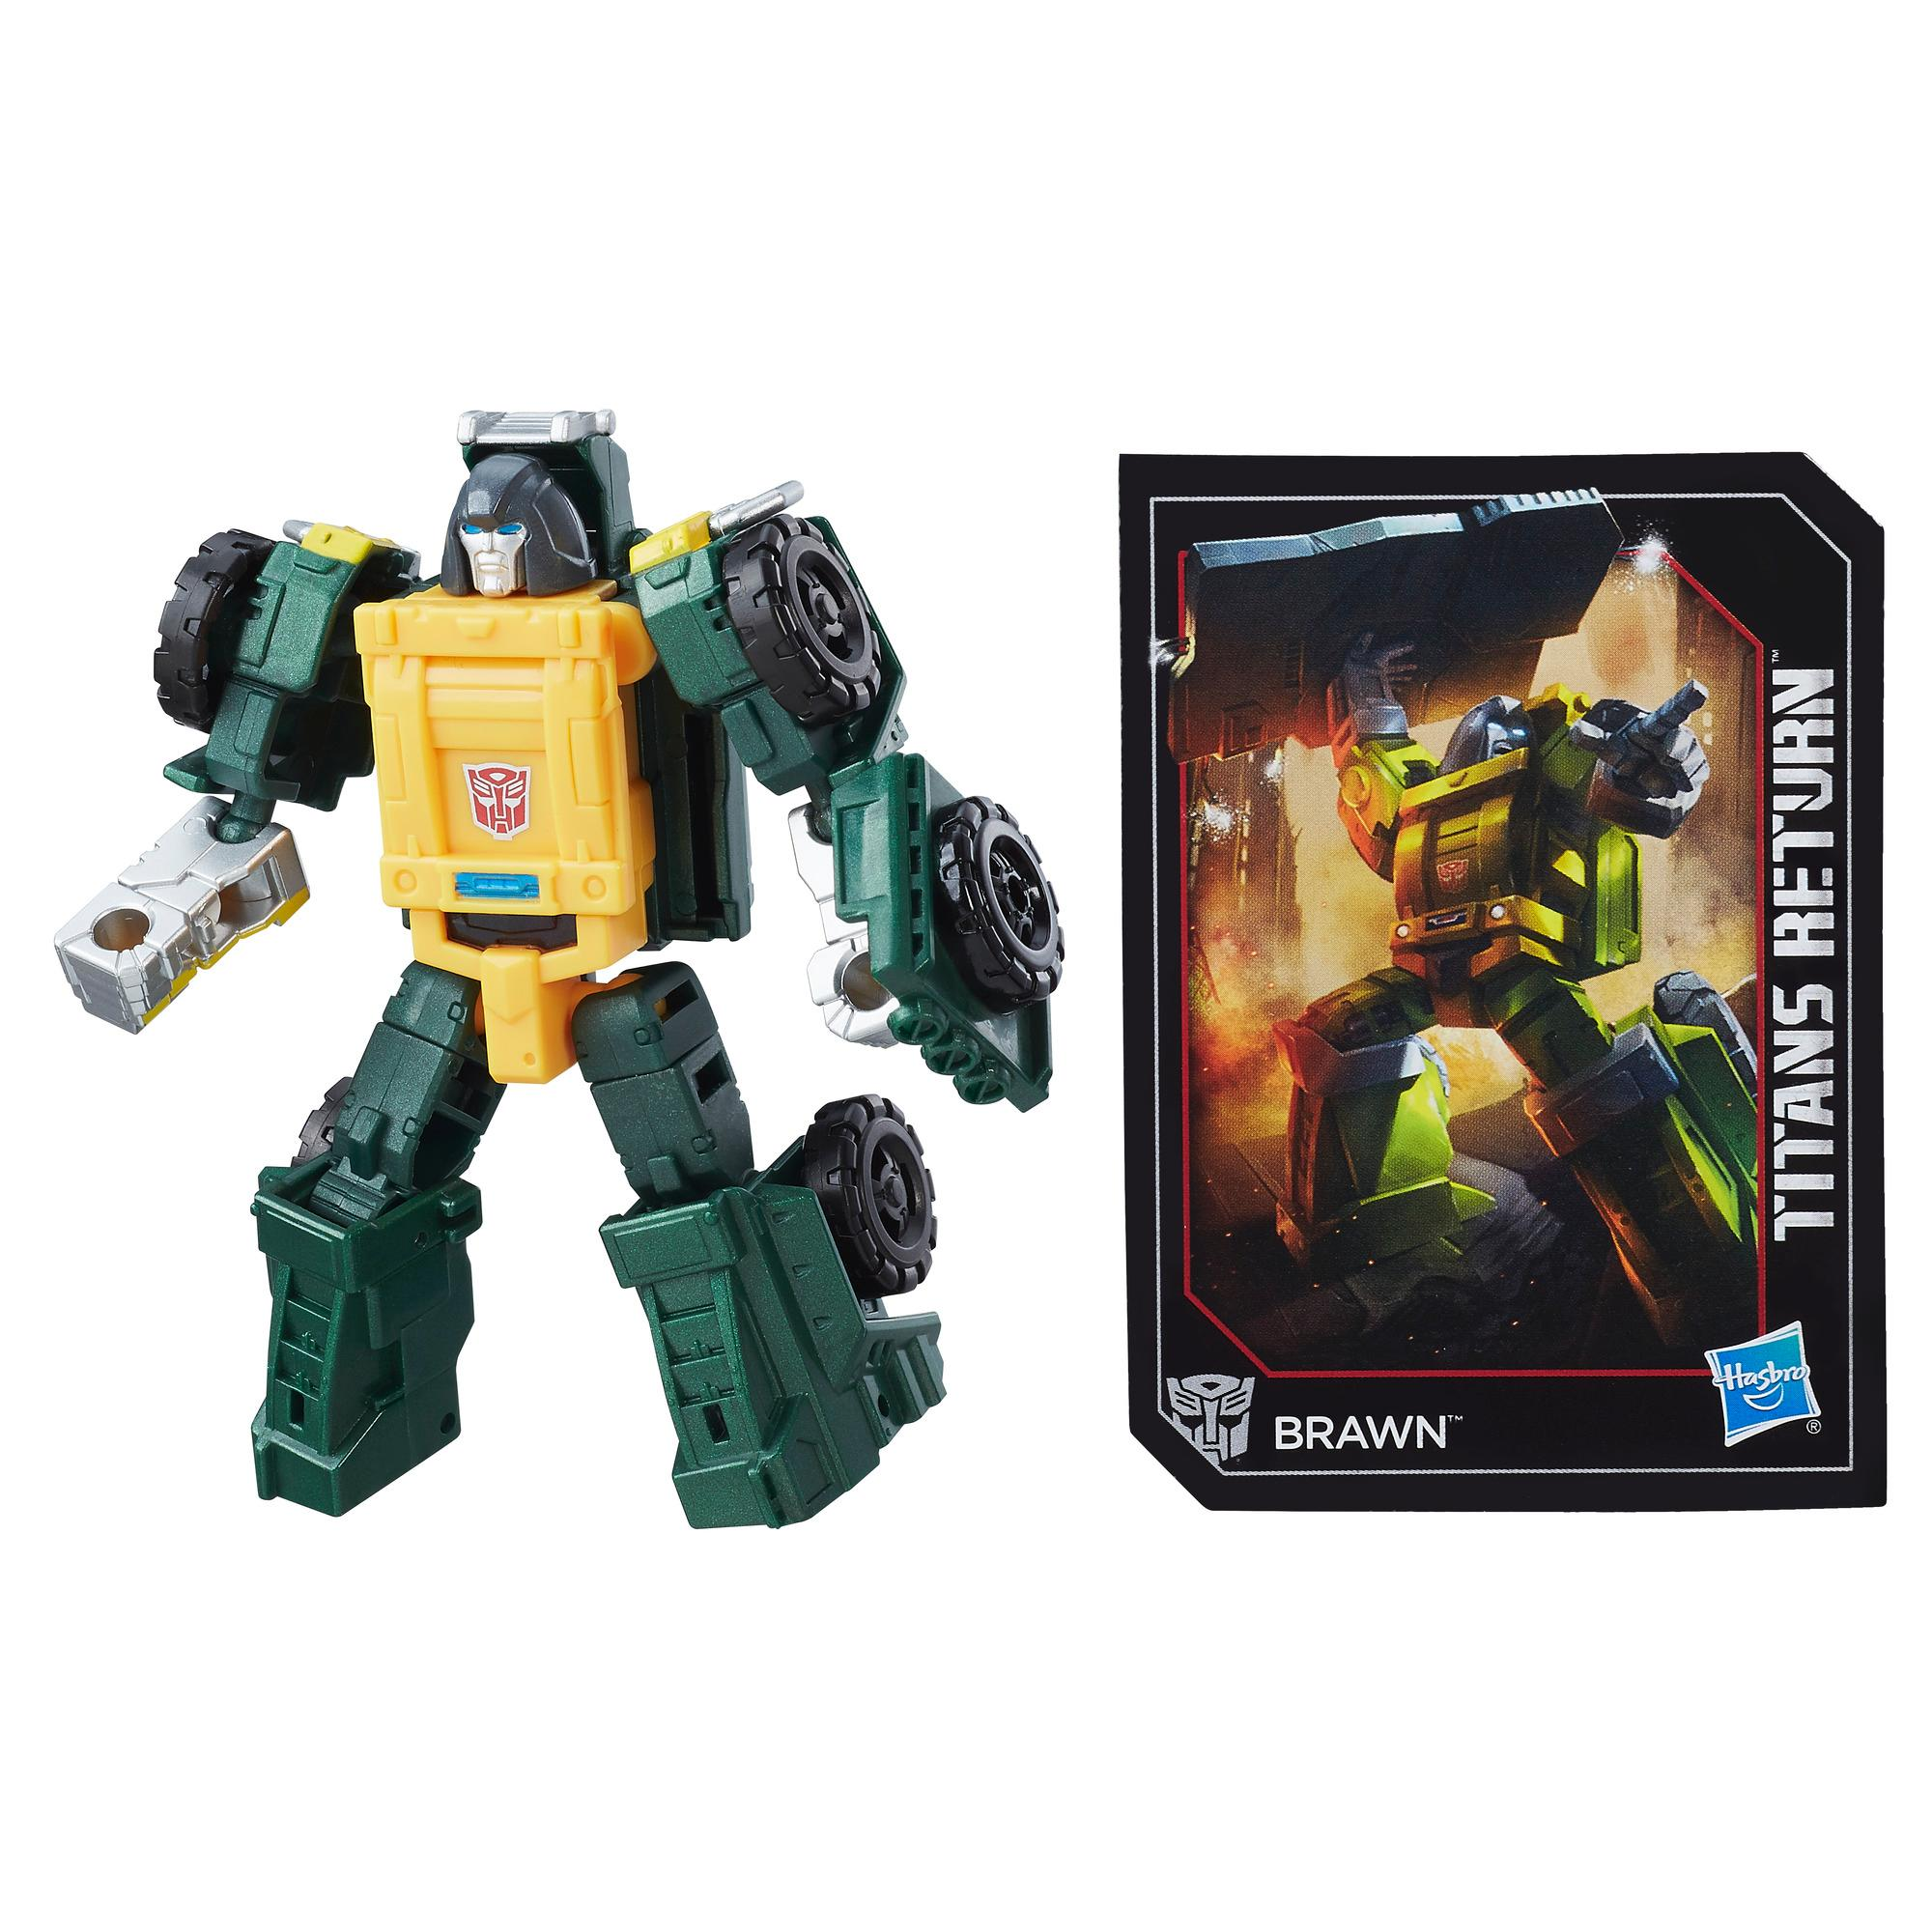 Transformers Generations Titans Return - Brawn clase leyendas